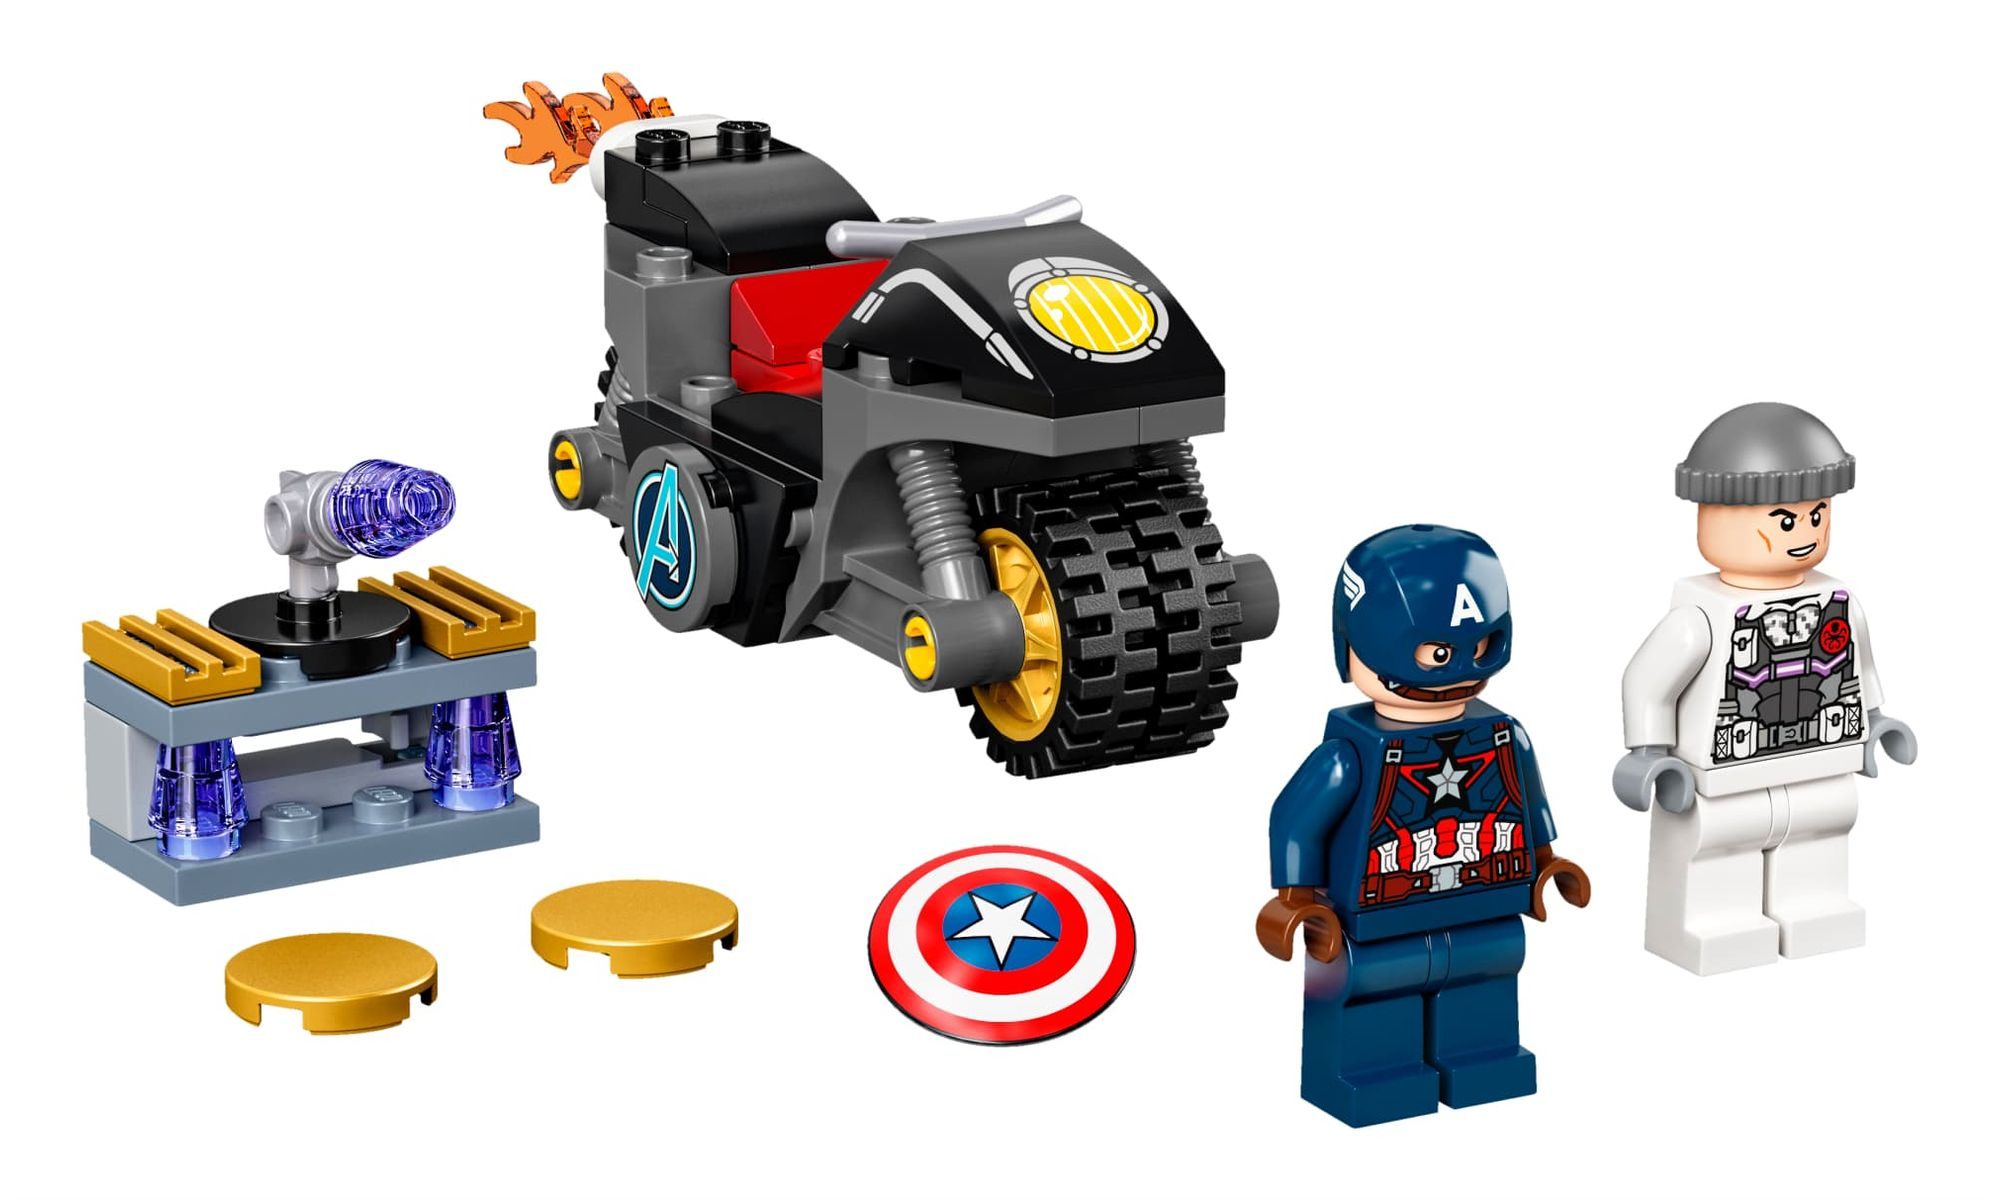 brinquedo-confronto-entre-capitao-america-e-hydra-lego